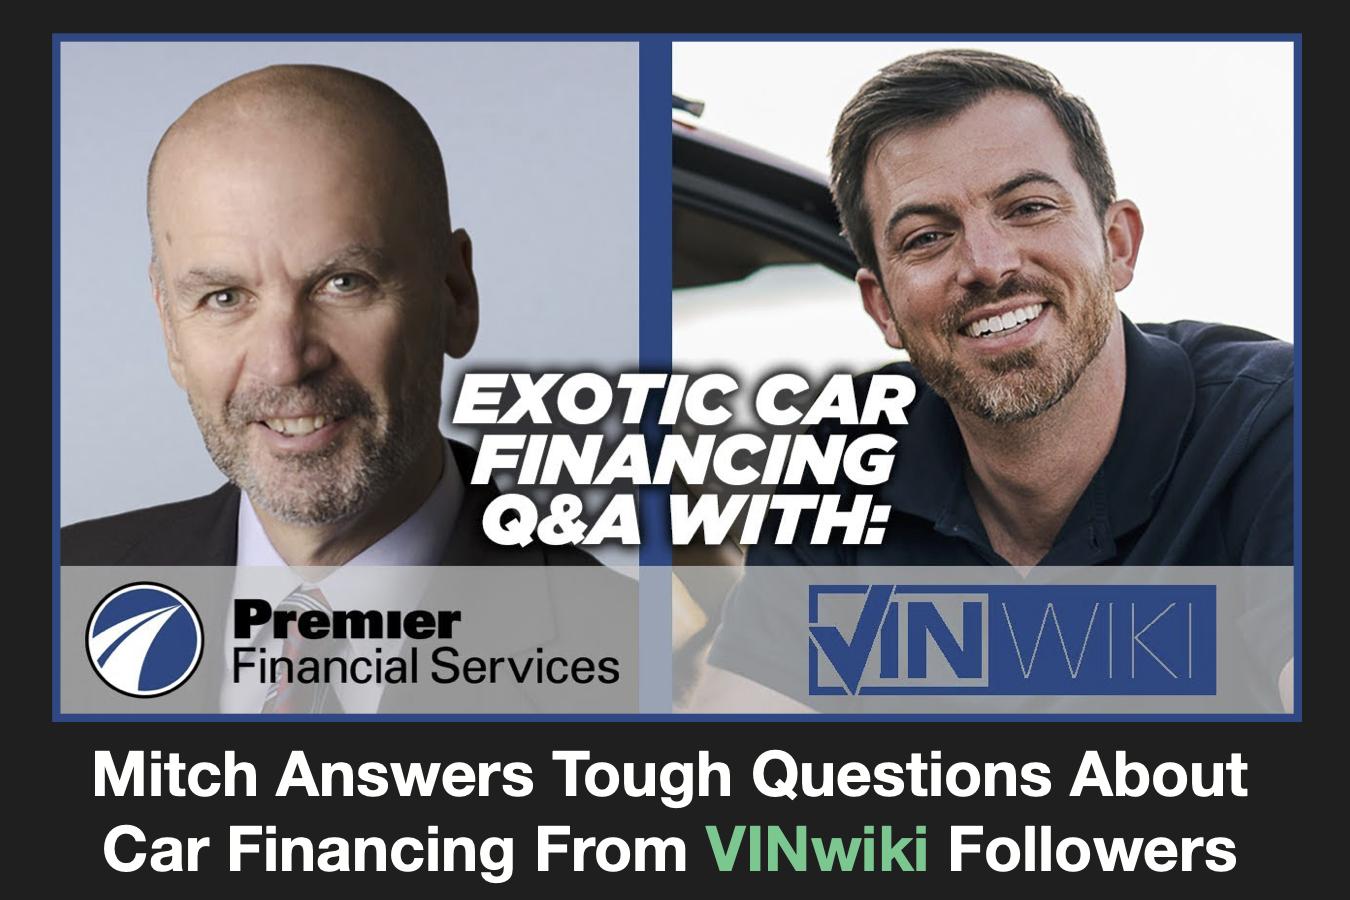 Vinwiki YouTube Q&A on Exotic Car Financing, Ed Bolian, Premier, #pfs_Leasing